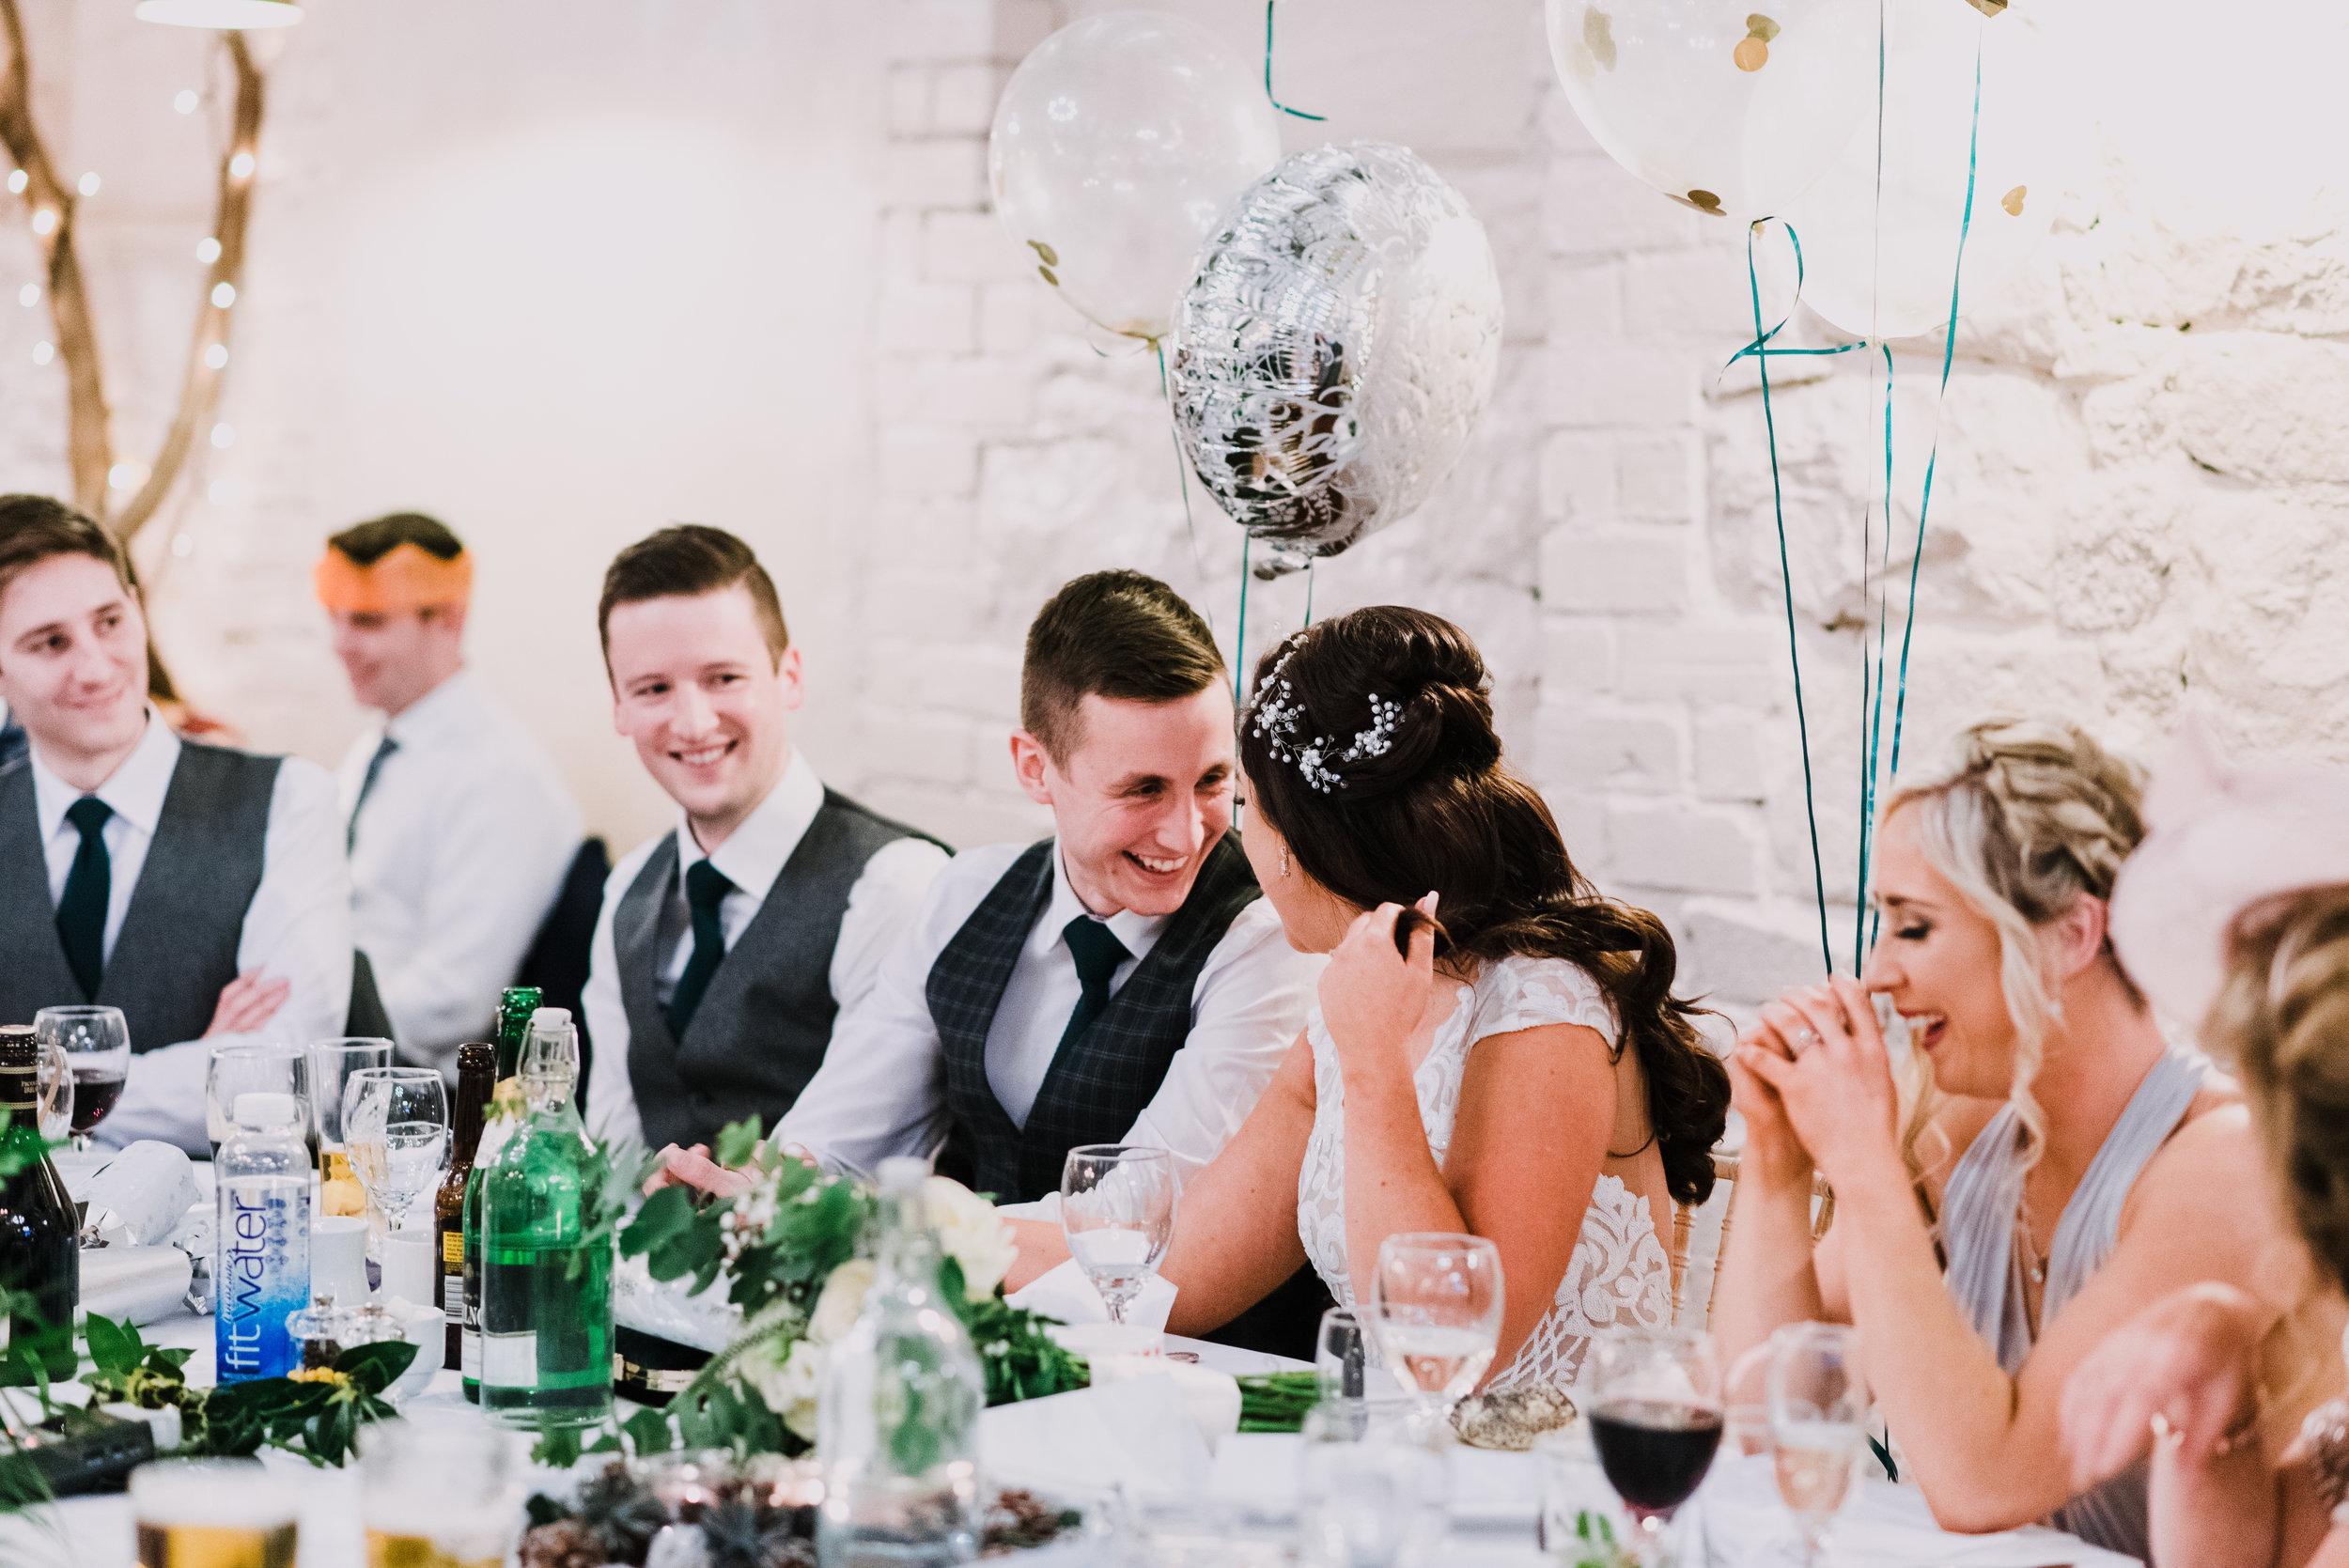 larchfield estate wedding, wedding venues northern ireland, barn wedding venues northern ireland, wedding photos larchfield estate, shane todd wedding, larchfield wedding decor ideas (23).jpg